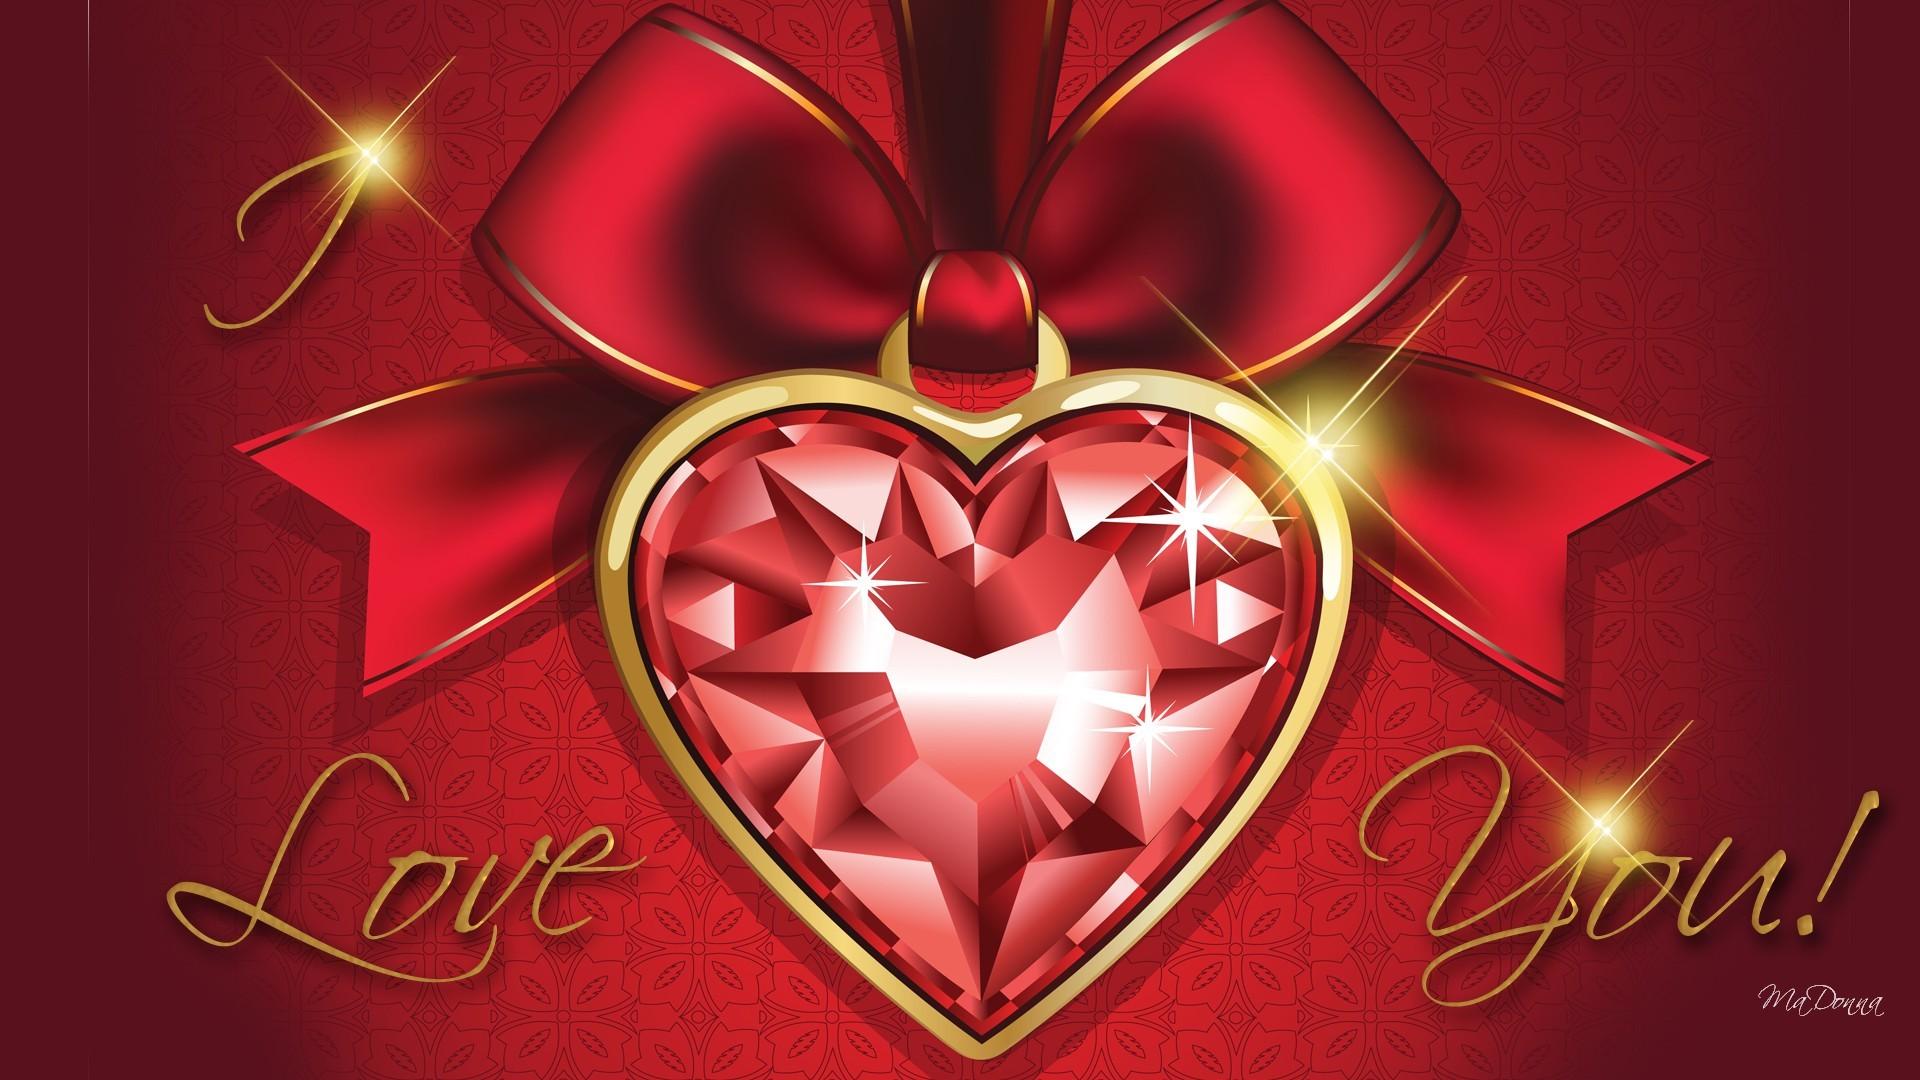 Valentine Heart Wallpaper 2017 Images Happy 13033code.jpg